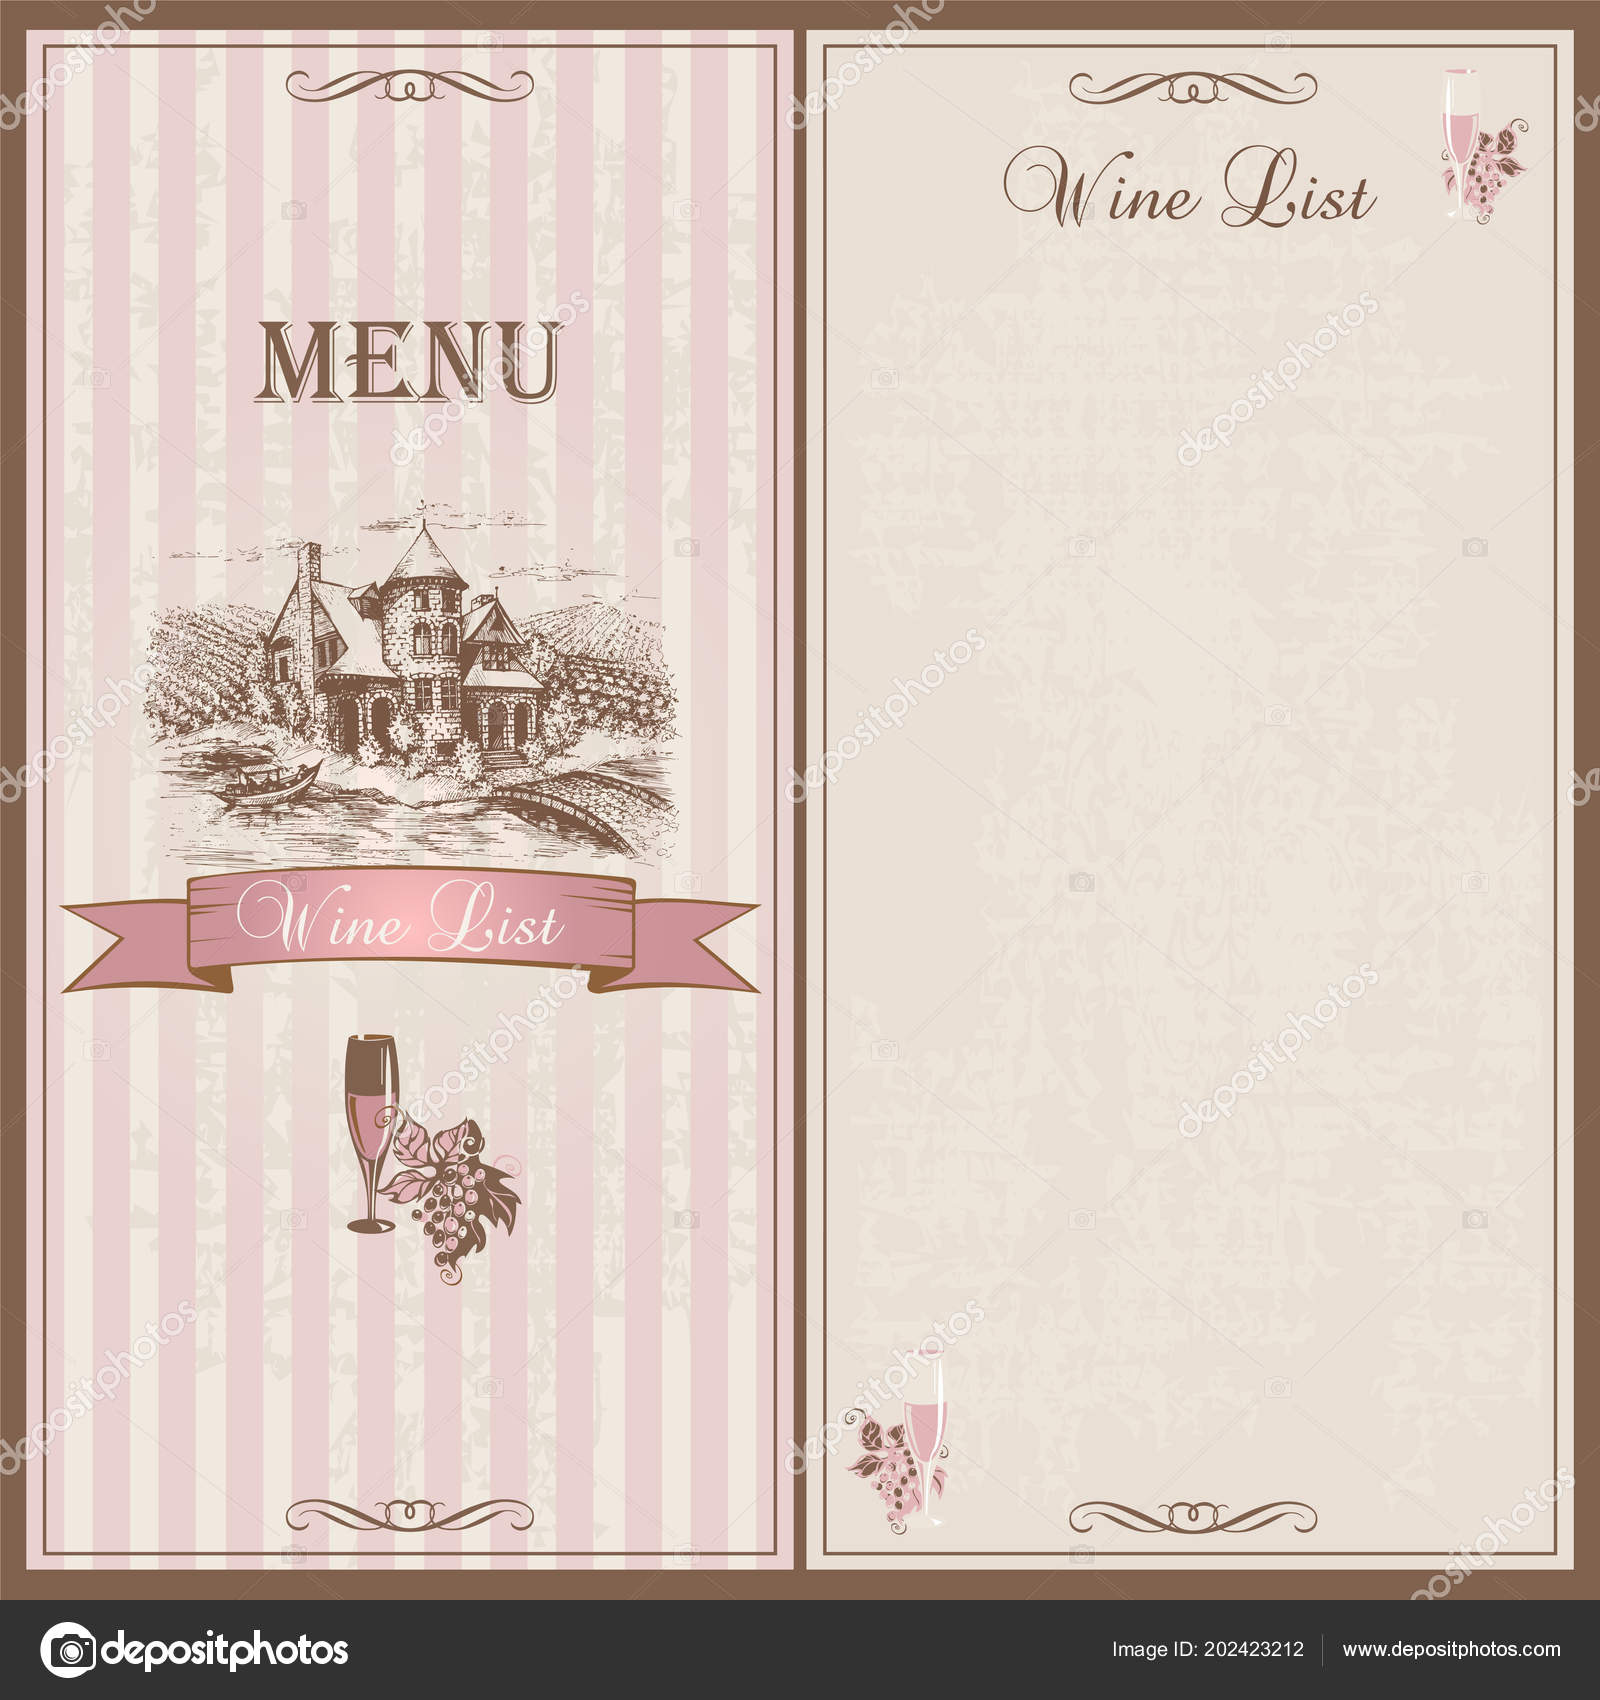 wine menu wine list template design restaurants sketch castle grape